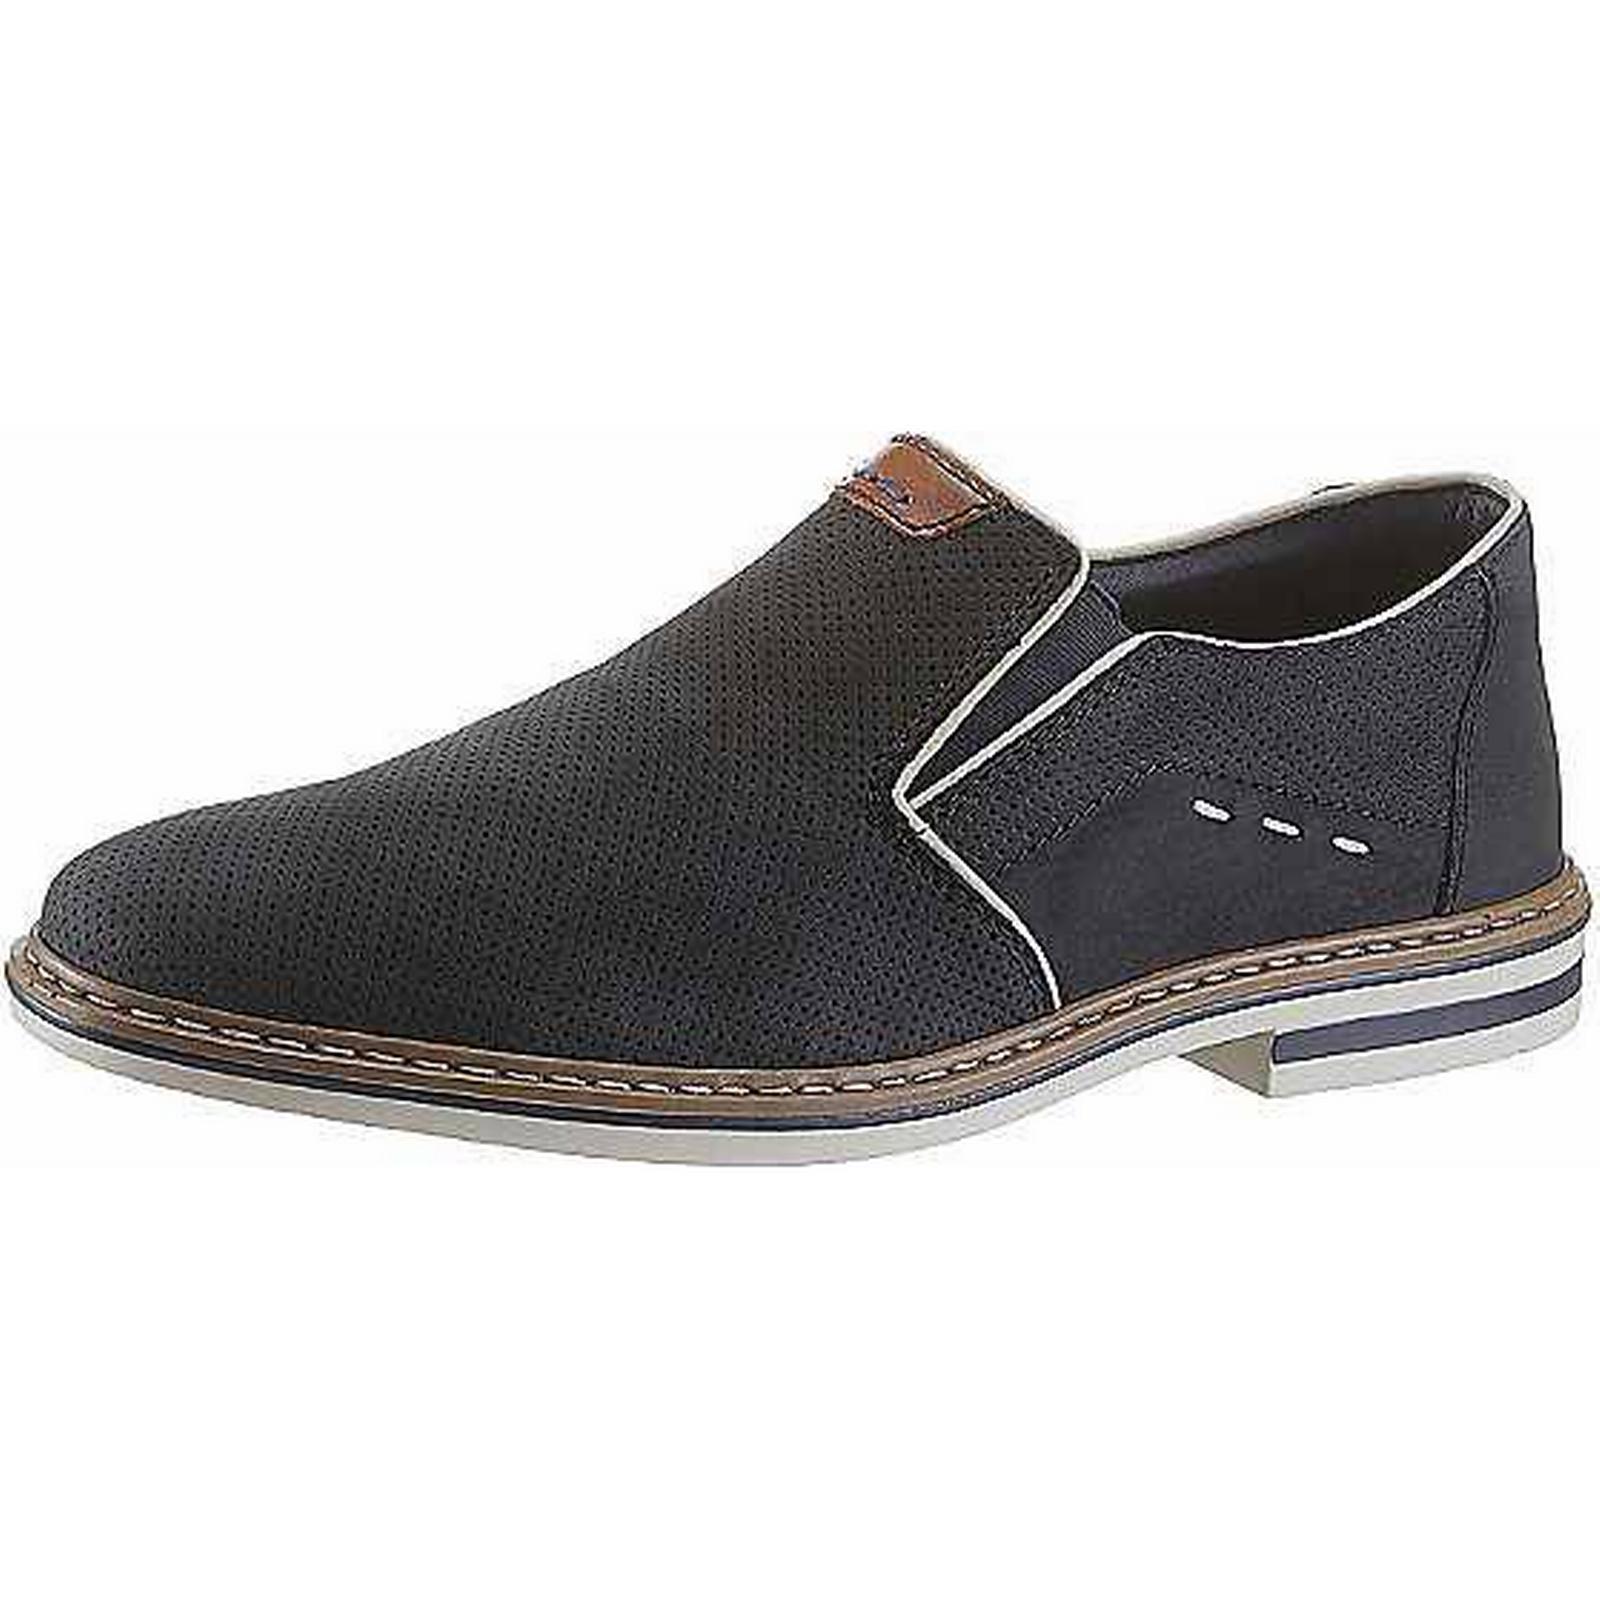 Rieker Slip-On Shoes by tidal Rieker:Man/Woman: List of tidal by shoes 9871ac